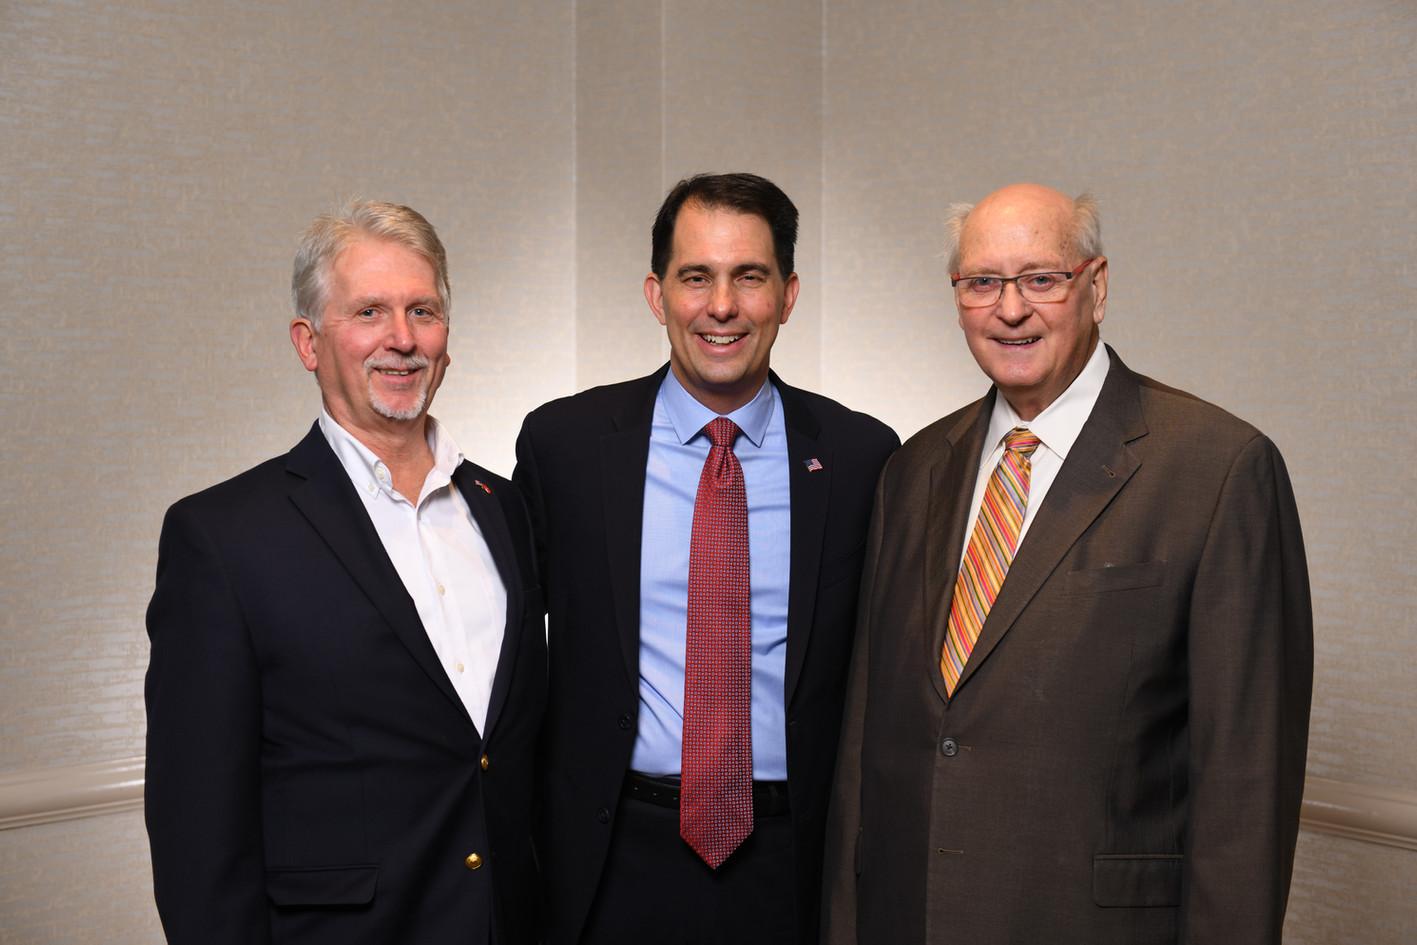 Bill Adams, Scott Walker, Bob Terry